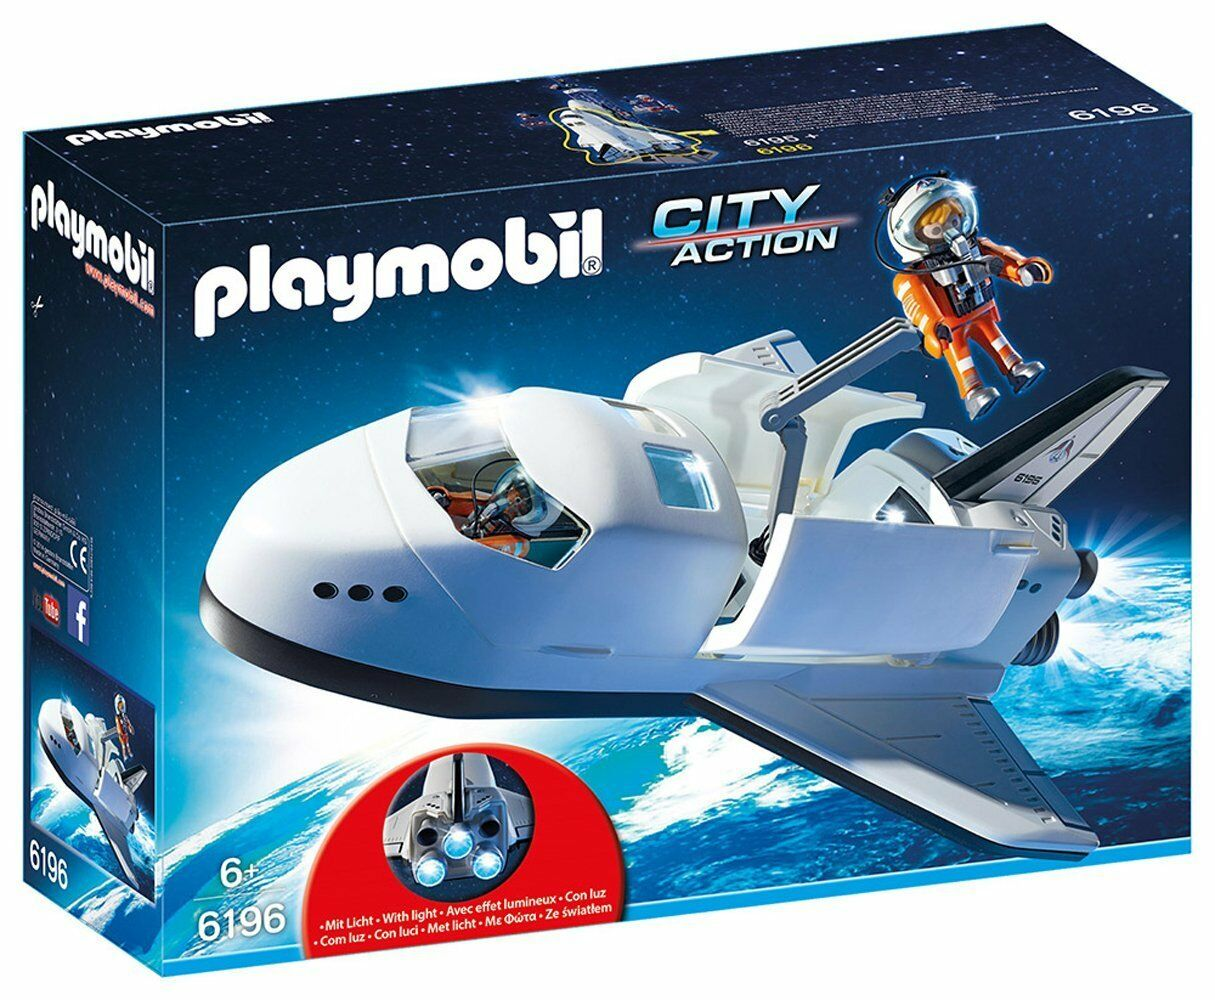 PLAYMOBIL 6196  spazio Shuttle nuovo Sealed  acquista online